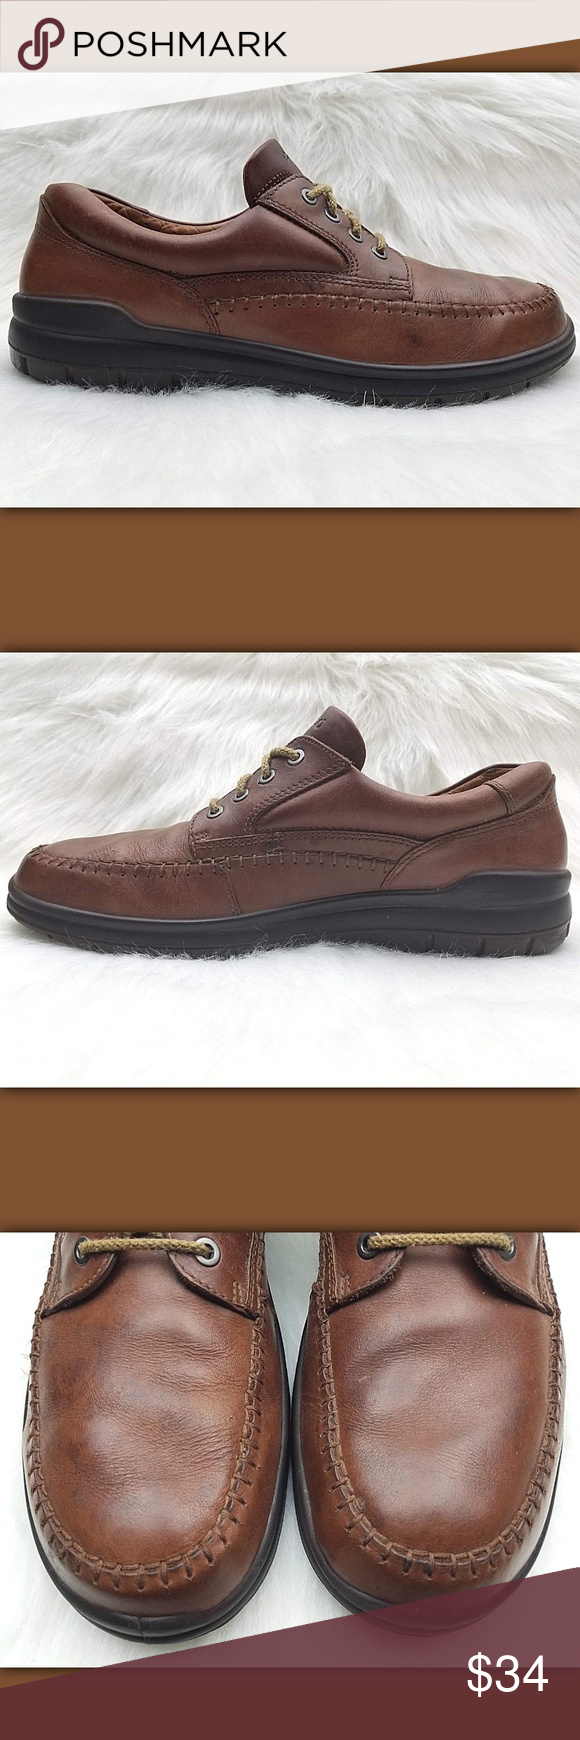 ECCO Seawalker Brown Leather Casual Derby Shoes ECCO MEN S CASUAL DERBY  SHOES Style  Seawalker Color 71d75de8ba695